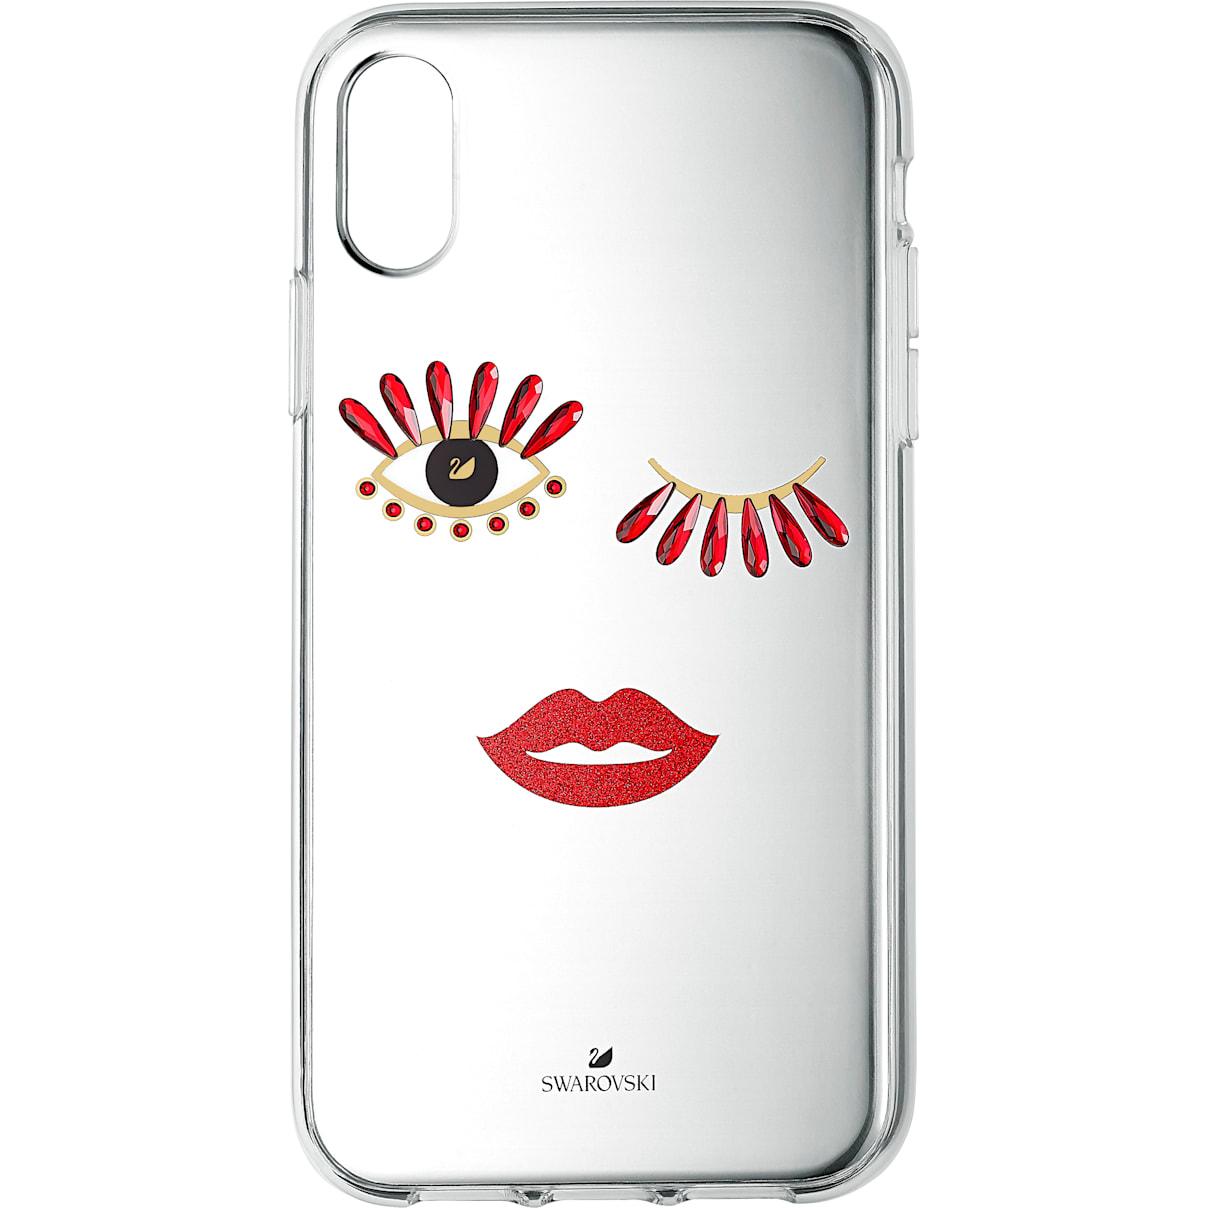 Swarovski New Love Smartphone Case, iPhone® XS Max